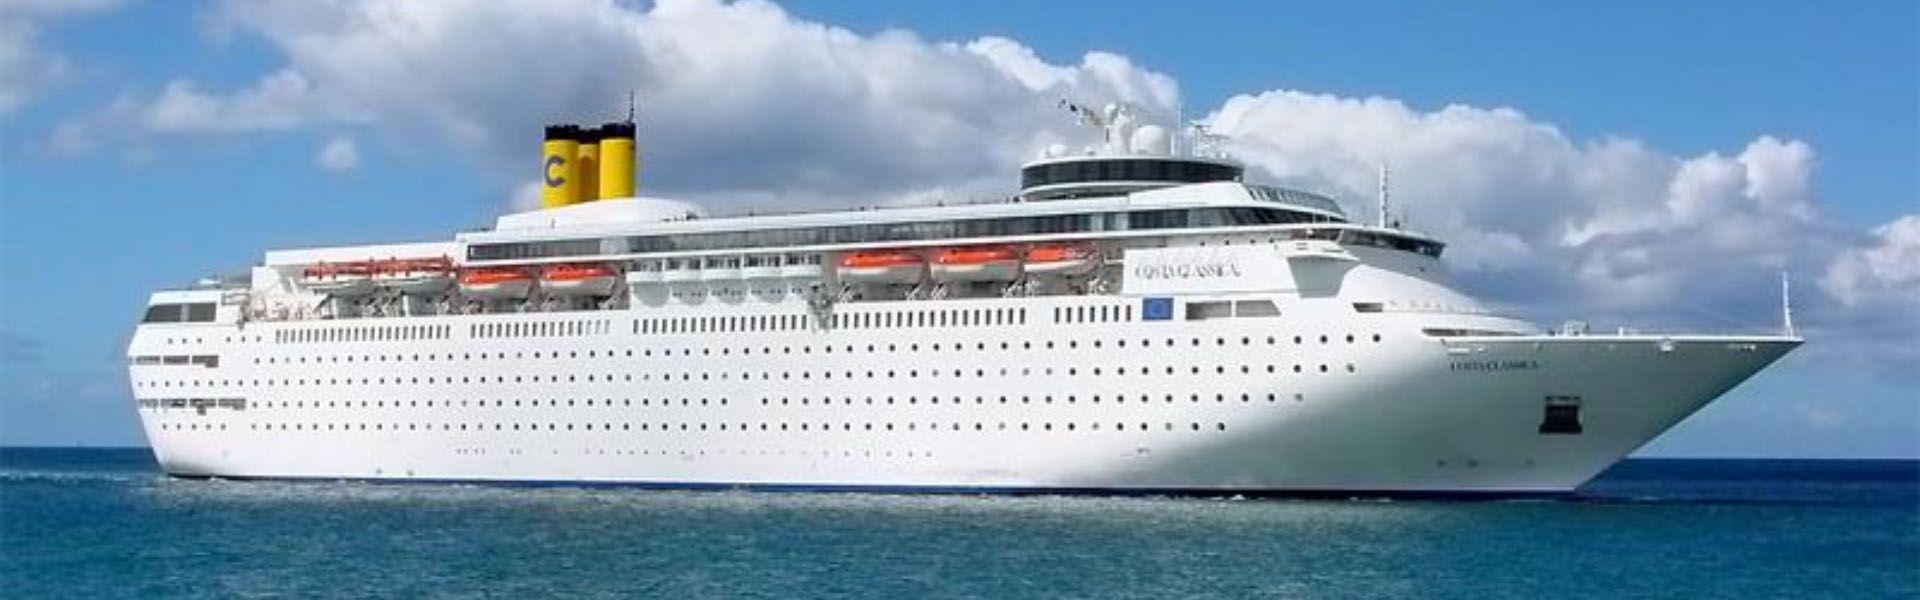 Croaziera 2017 - Oceanul Indian (Male) - Costa Cruises - Costa neoClasica - 7 nopti